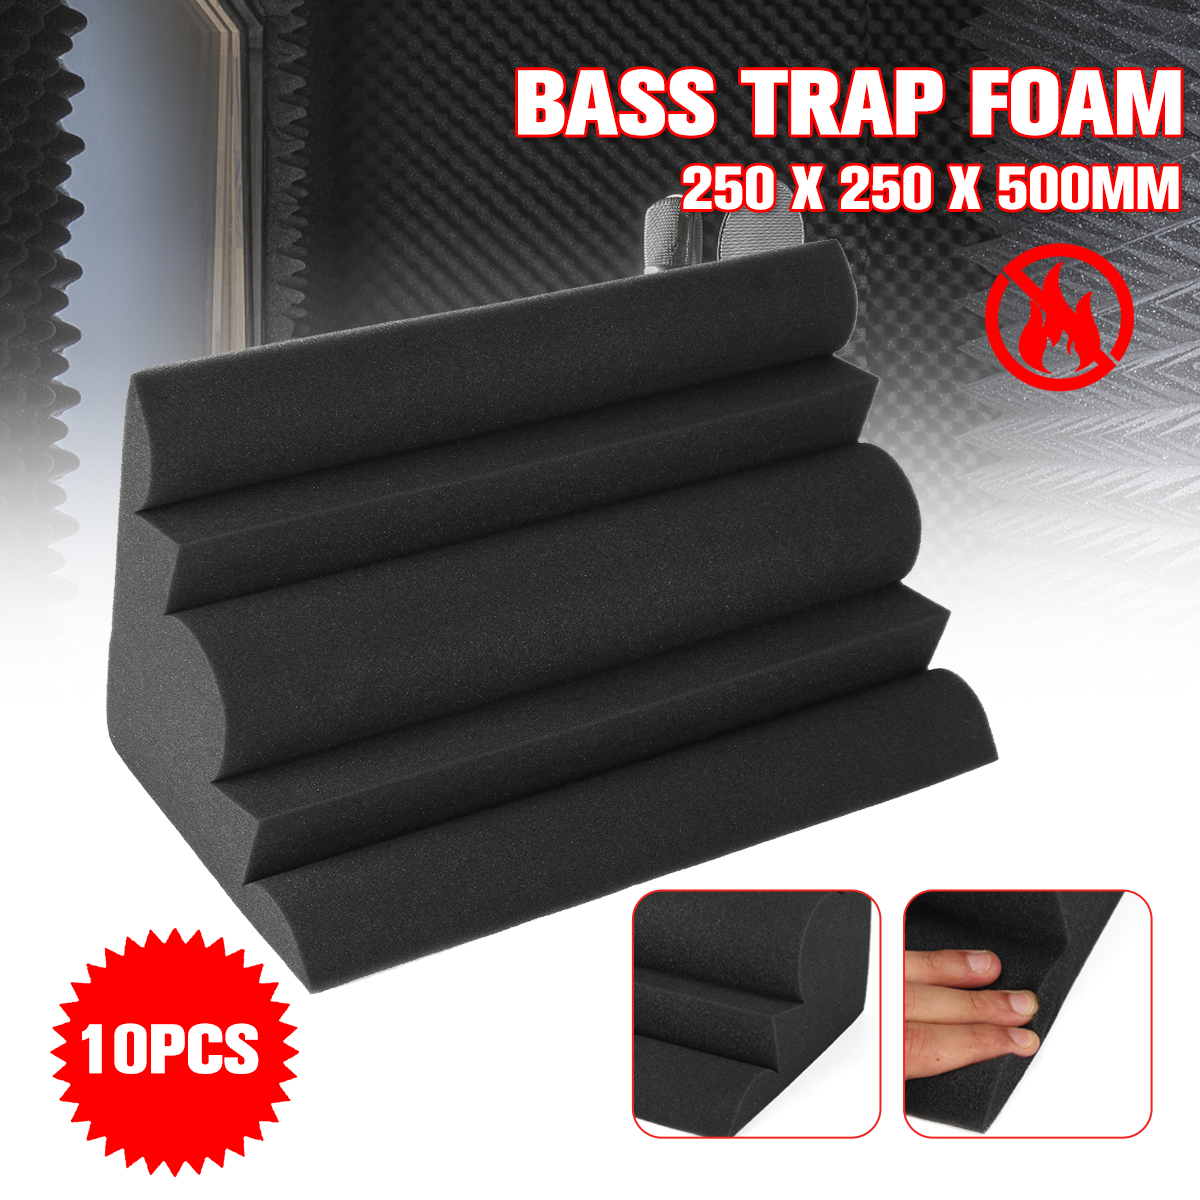 10 piezas 250x250x500mm acústica Bass trampa espuma acústica para pared esquina esponja insonorizadas estudio absorción Wedge Tiles espuma